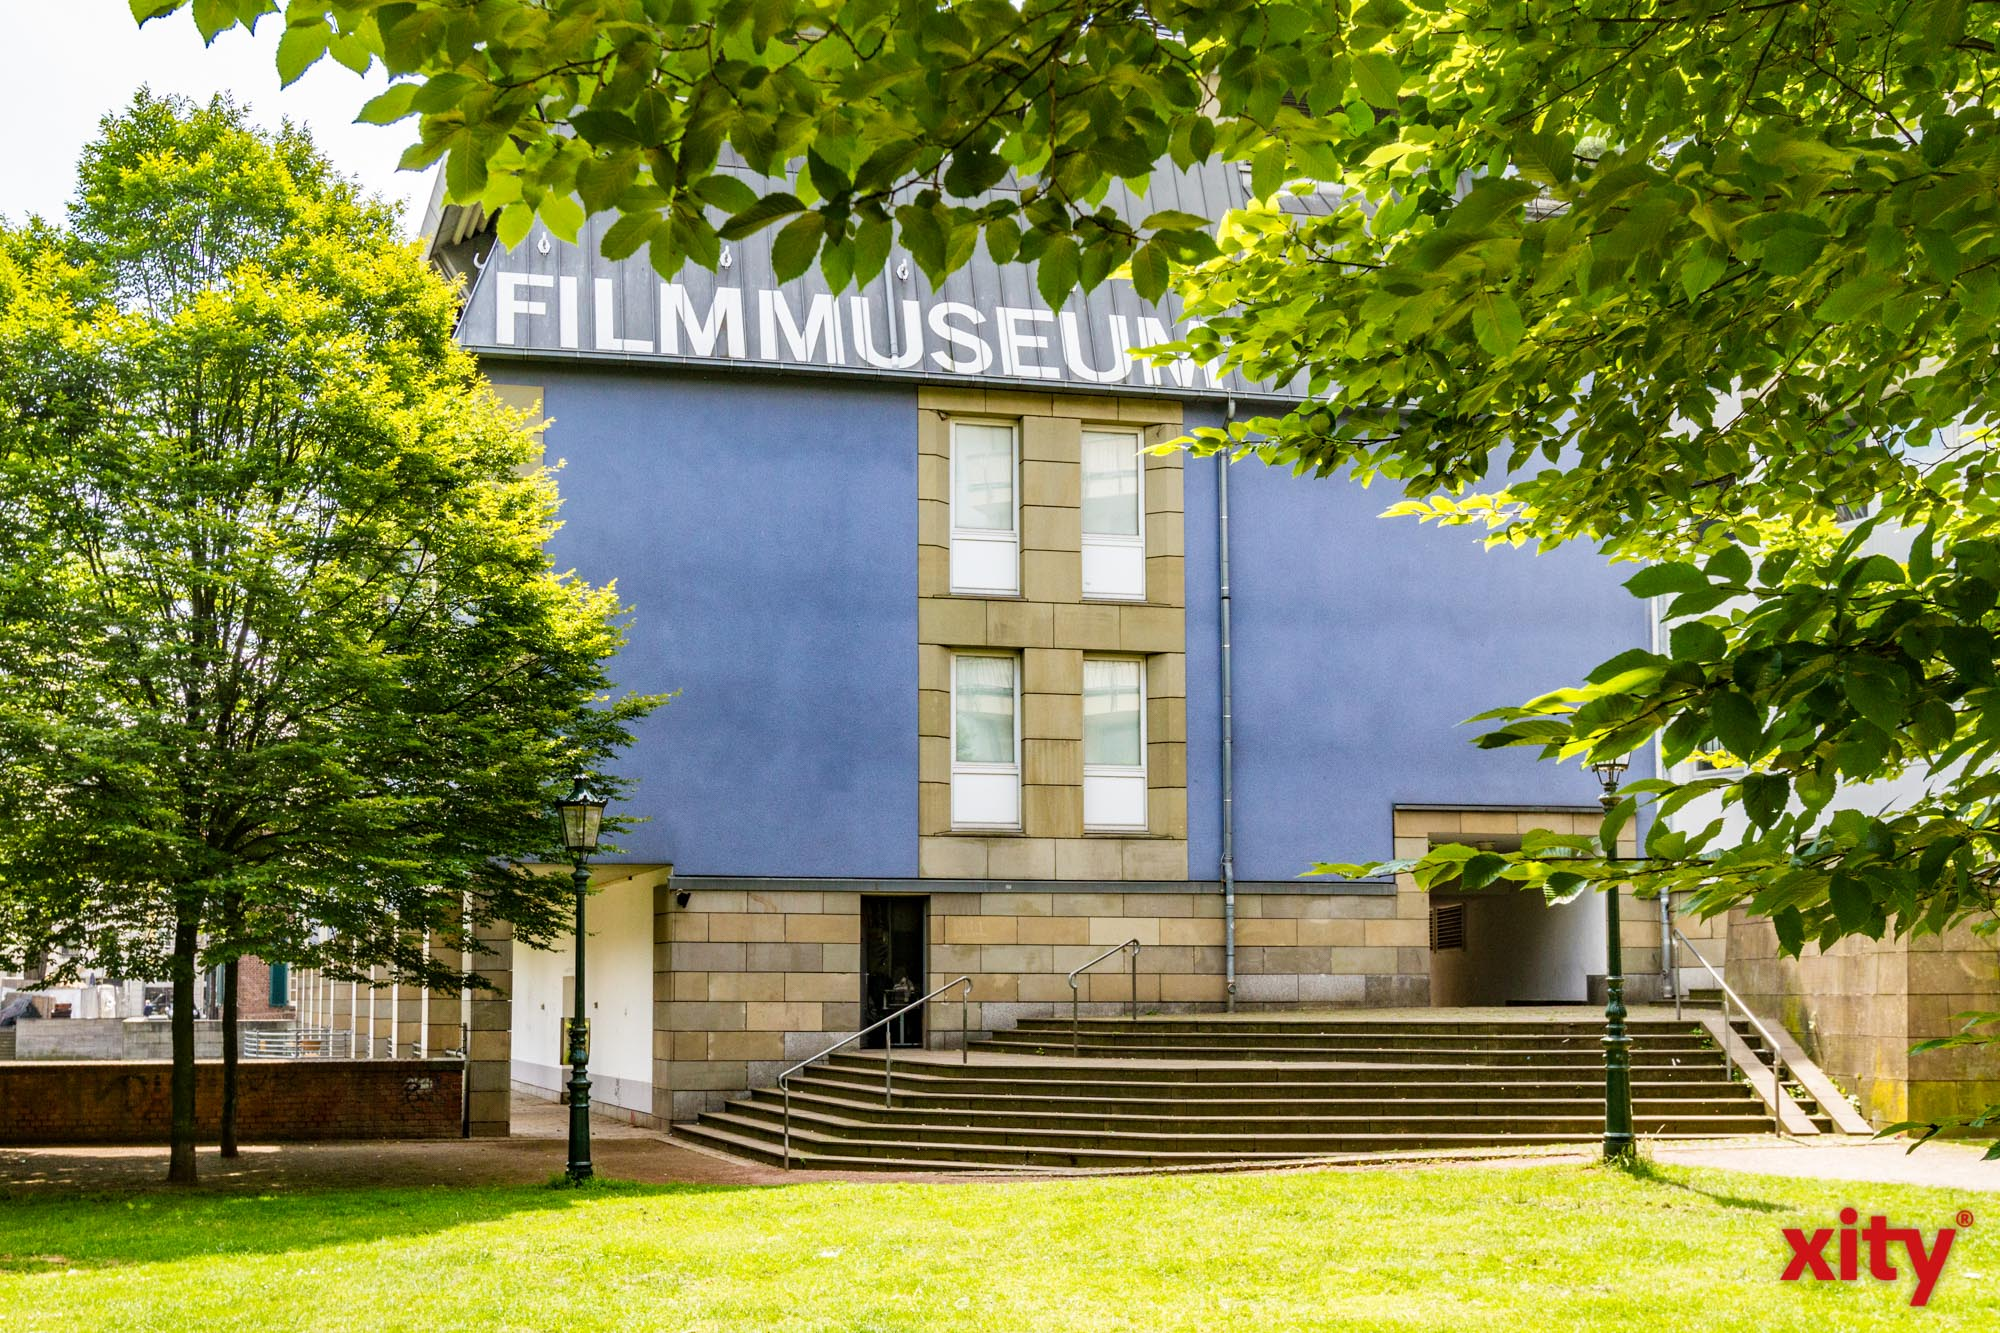 Filmmuseum verlängert Sonderausstellung bis August